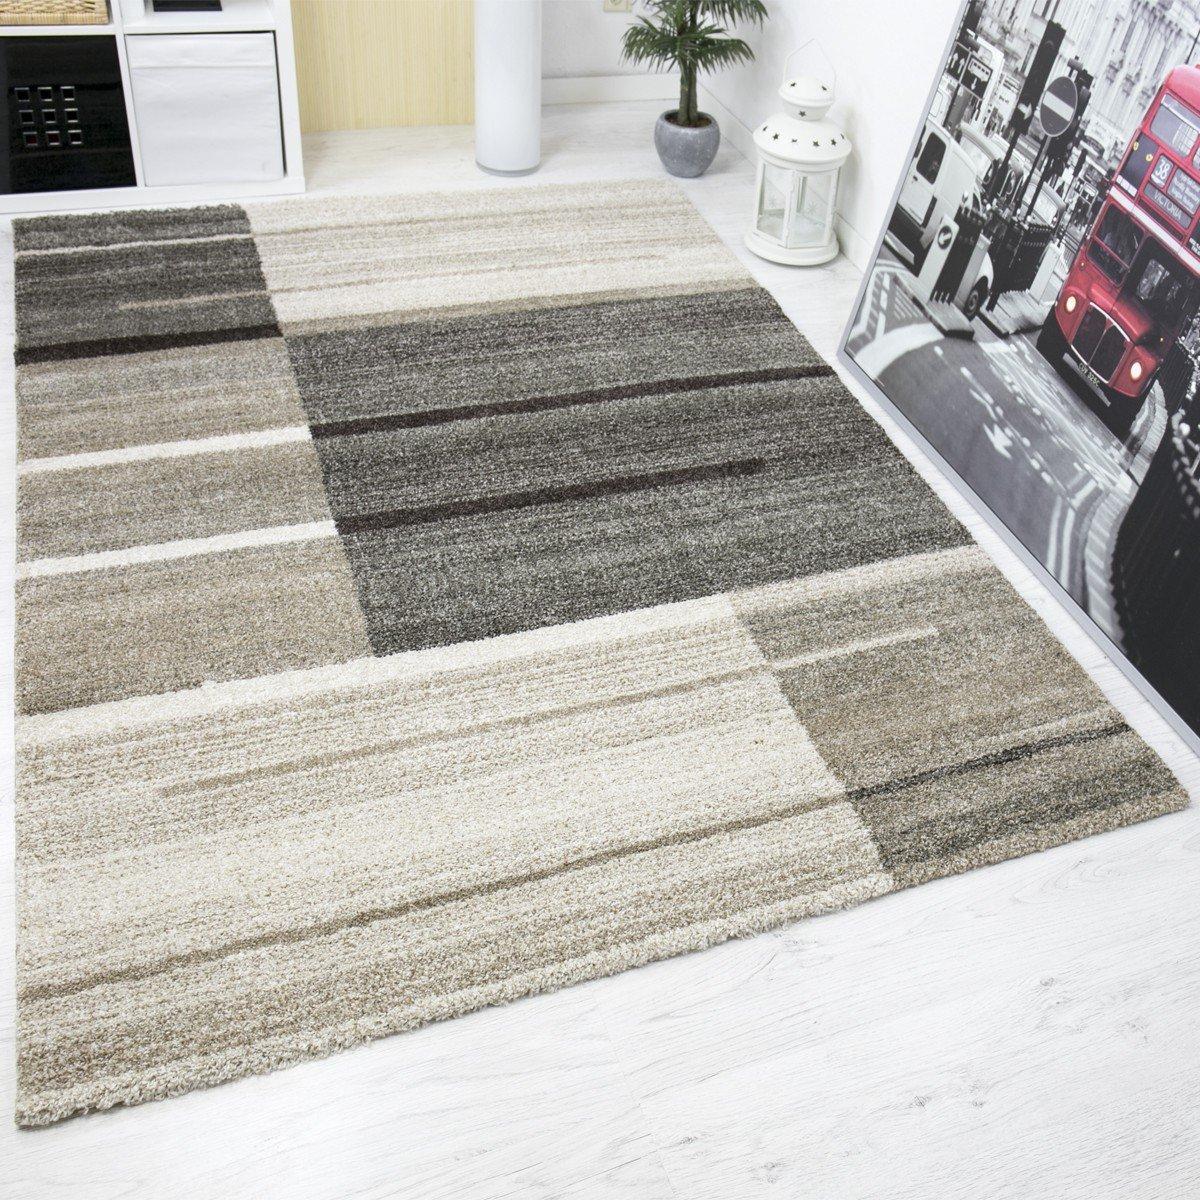 VIMODA Hochwertiger Teppich Beige Grau Kariert Modern Dichter Hoher Flor Mehrfarbig Used Optik, Maße 240x340 cm